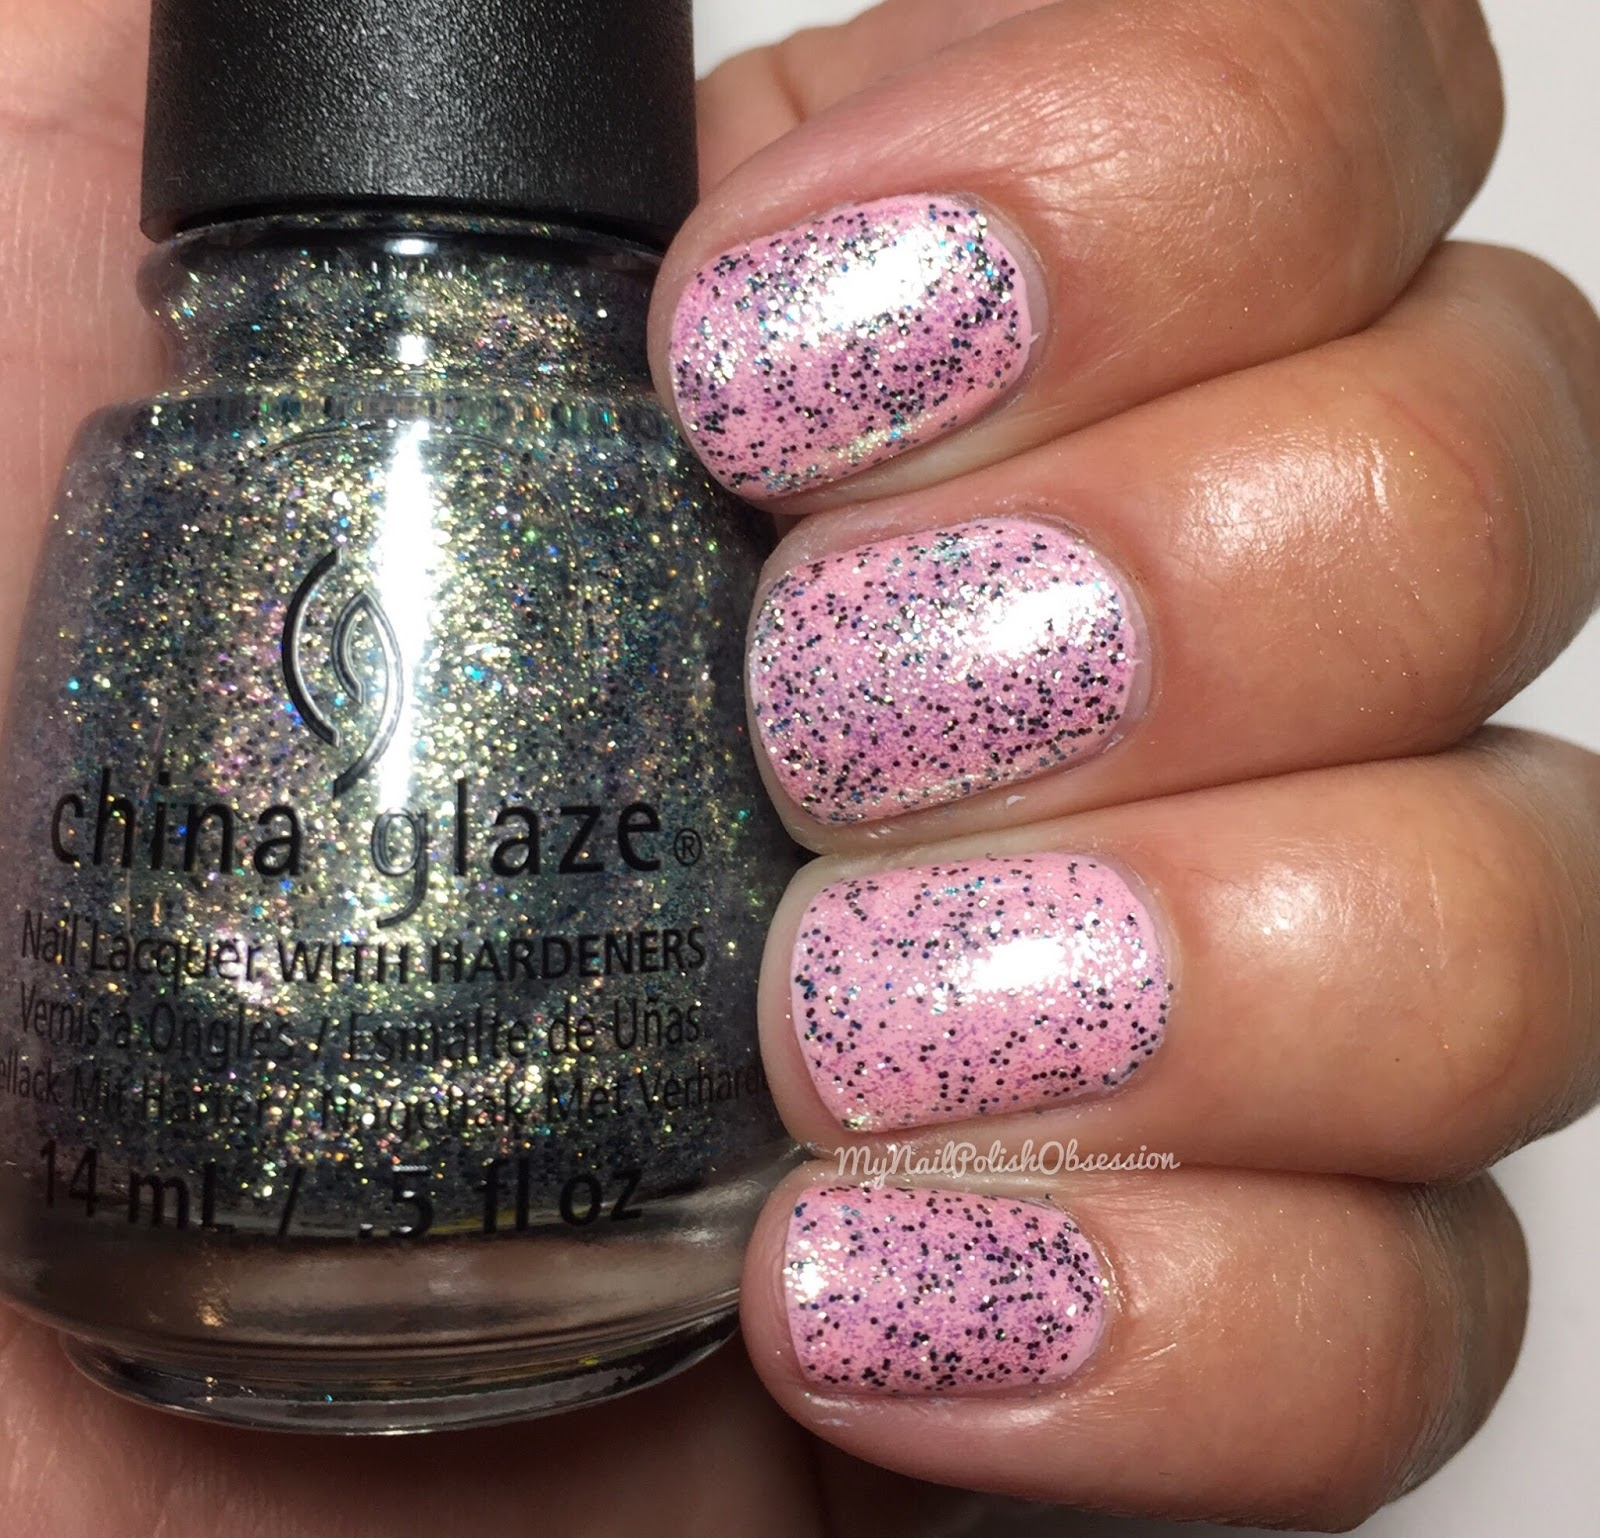 My Nail Polish Obsession: China Glaze Rebel Collection; Fall 2016